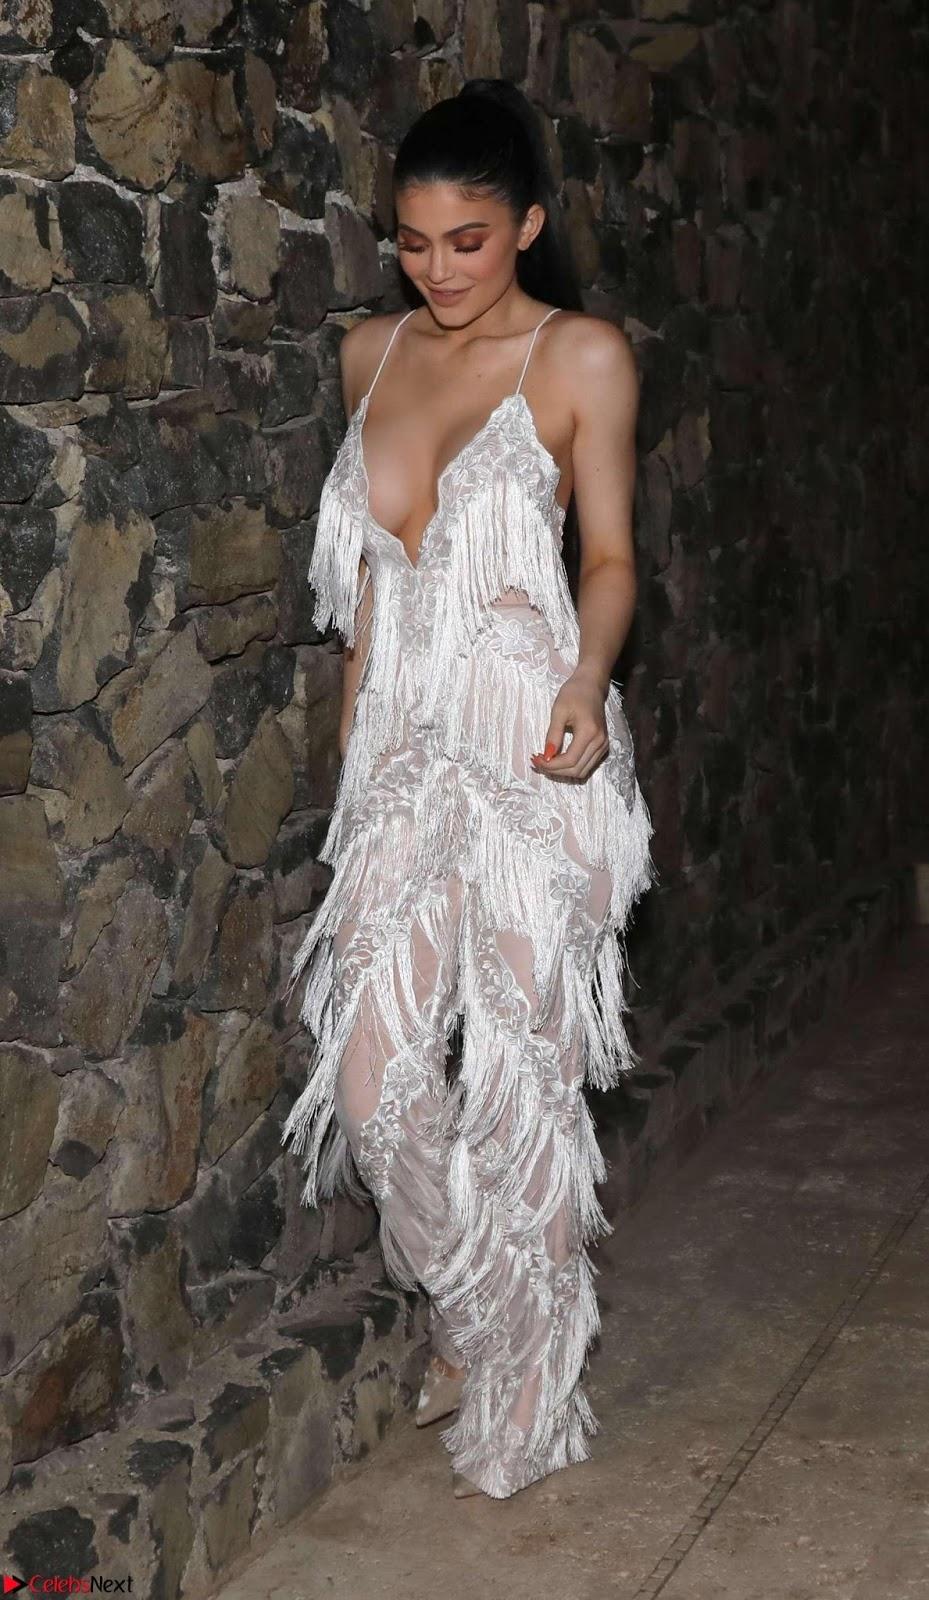 [Big Ass February] Kylie Jenner Kim Kardashian Huge Ass Massive Boobs in Feb 2017 Instagram Leaked Pics WOW